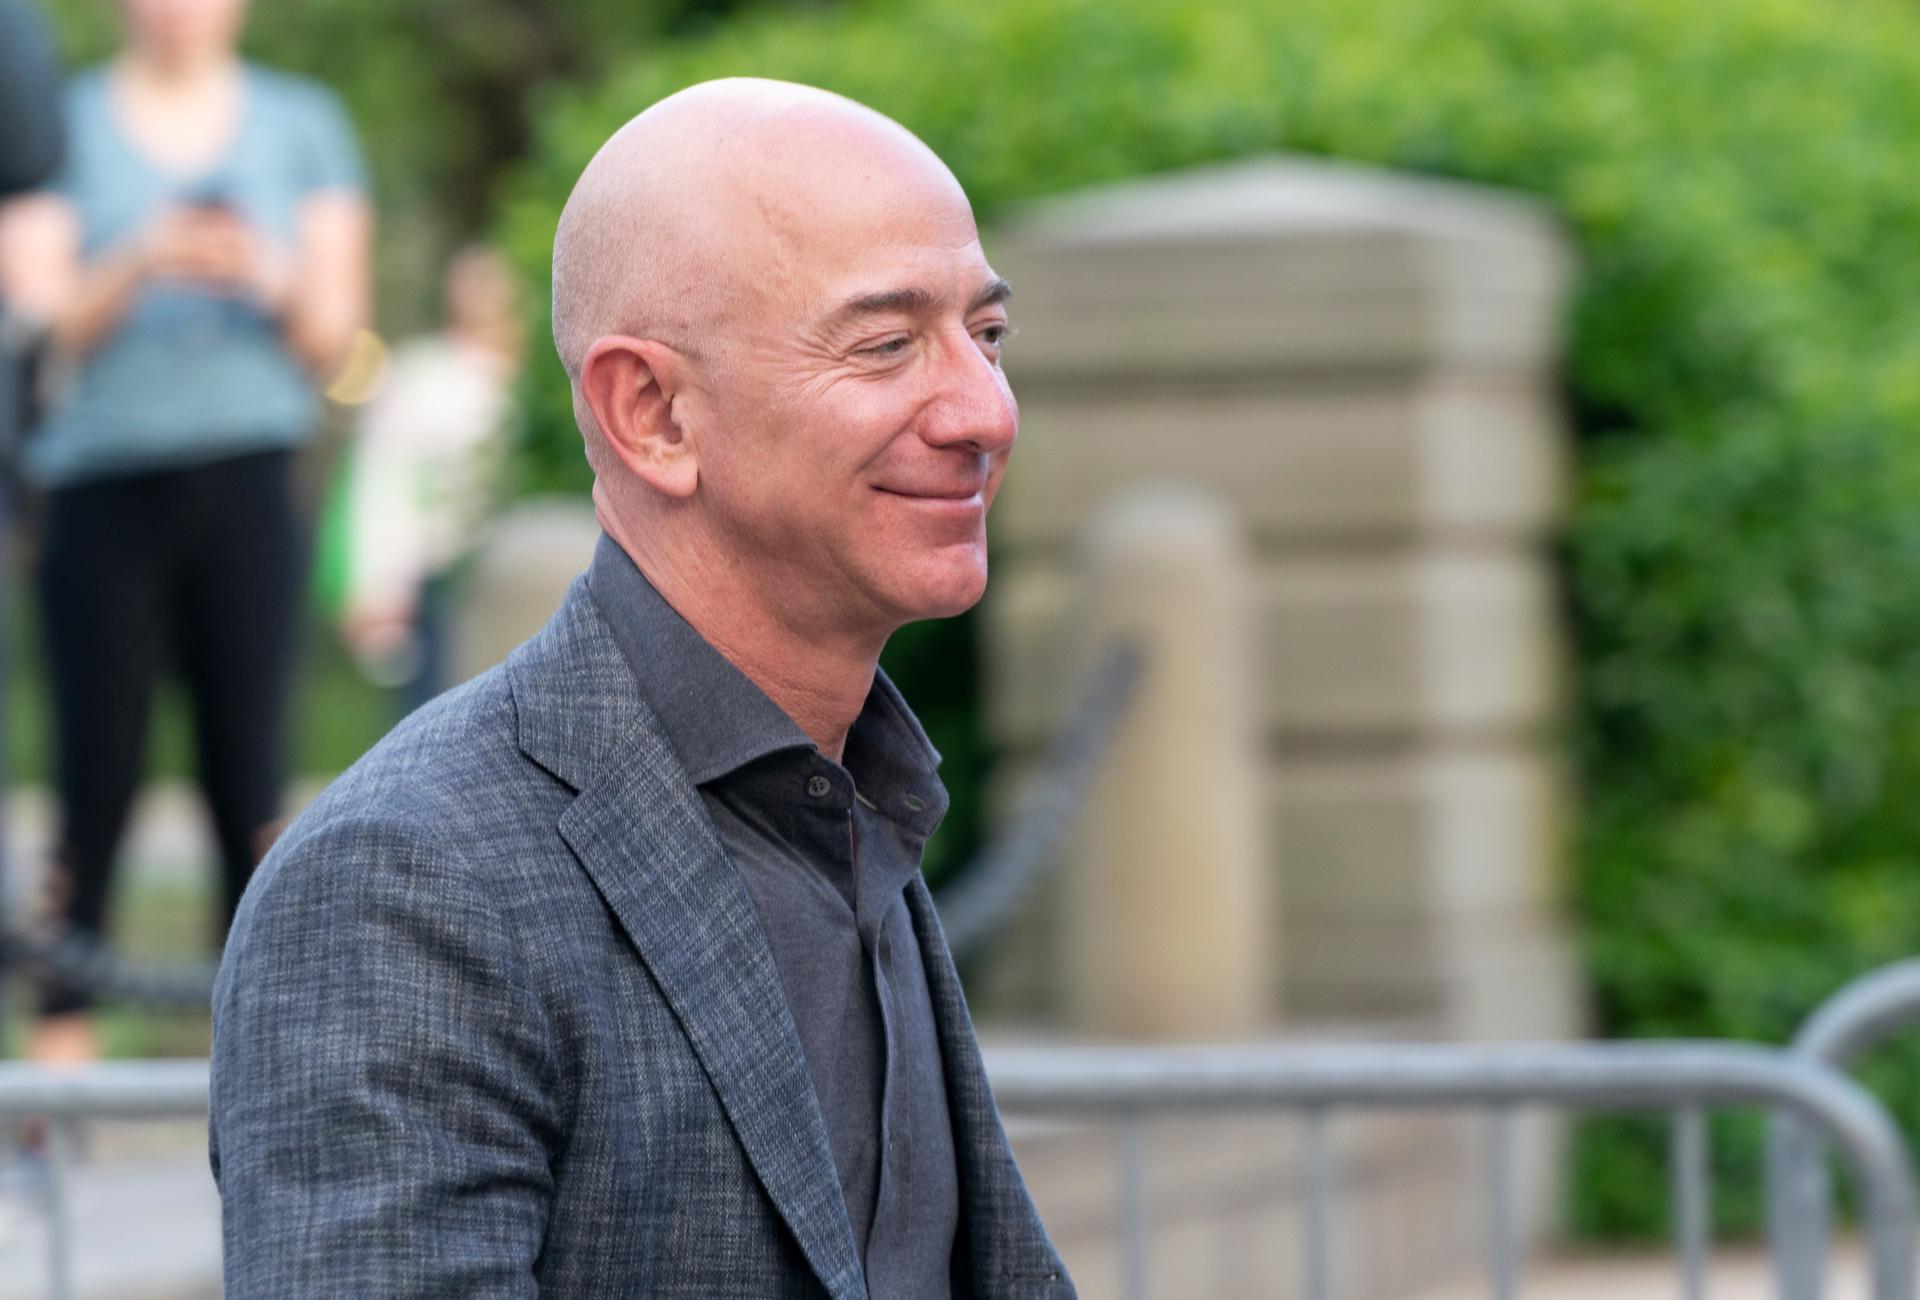 UN calls for investigation into Jeff Bezos phone hack